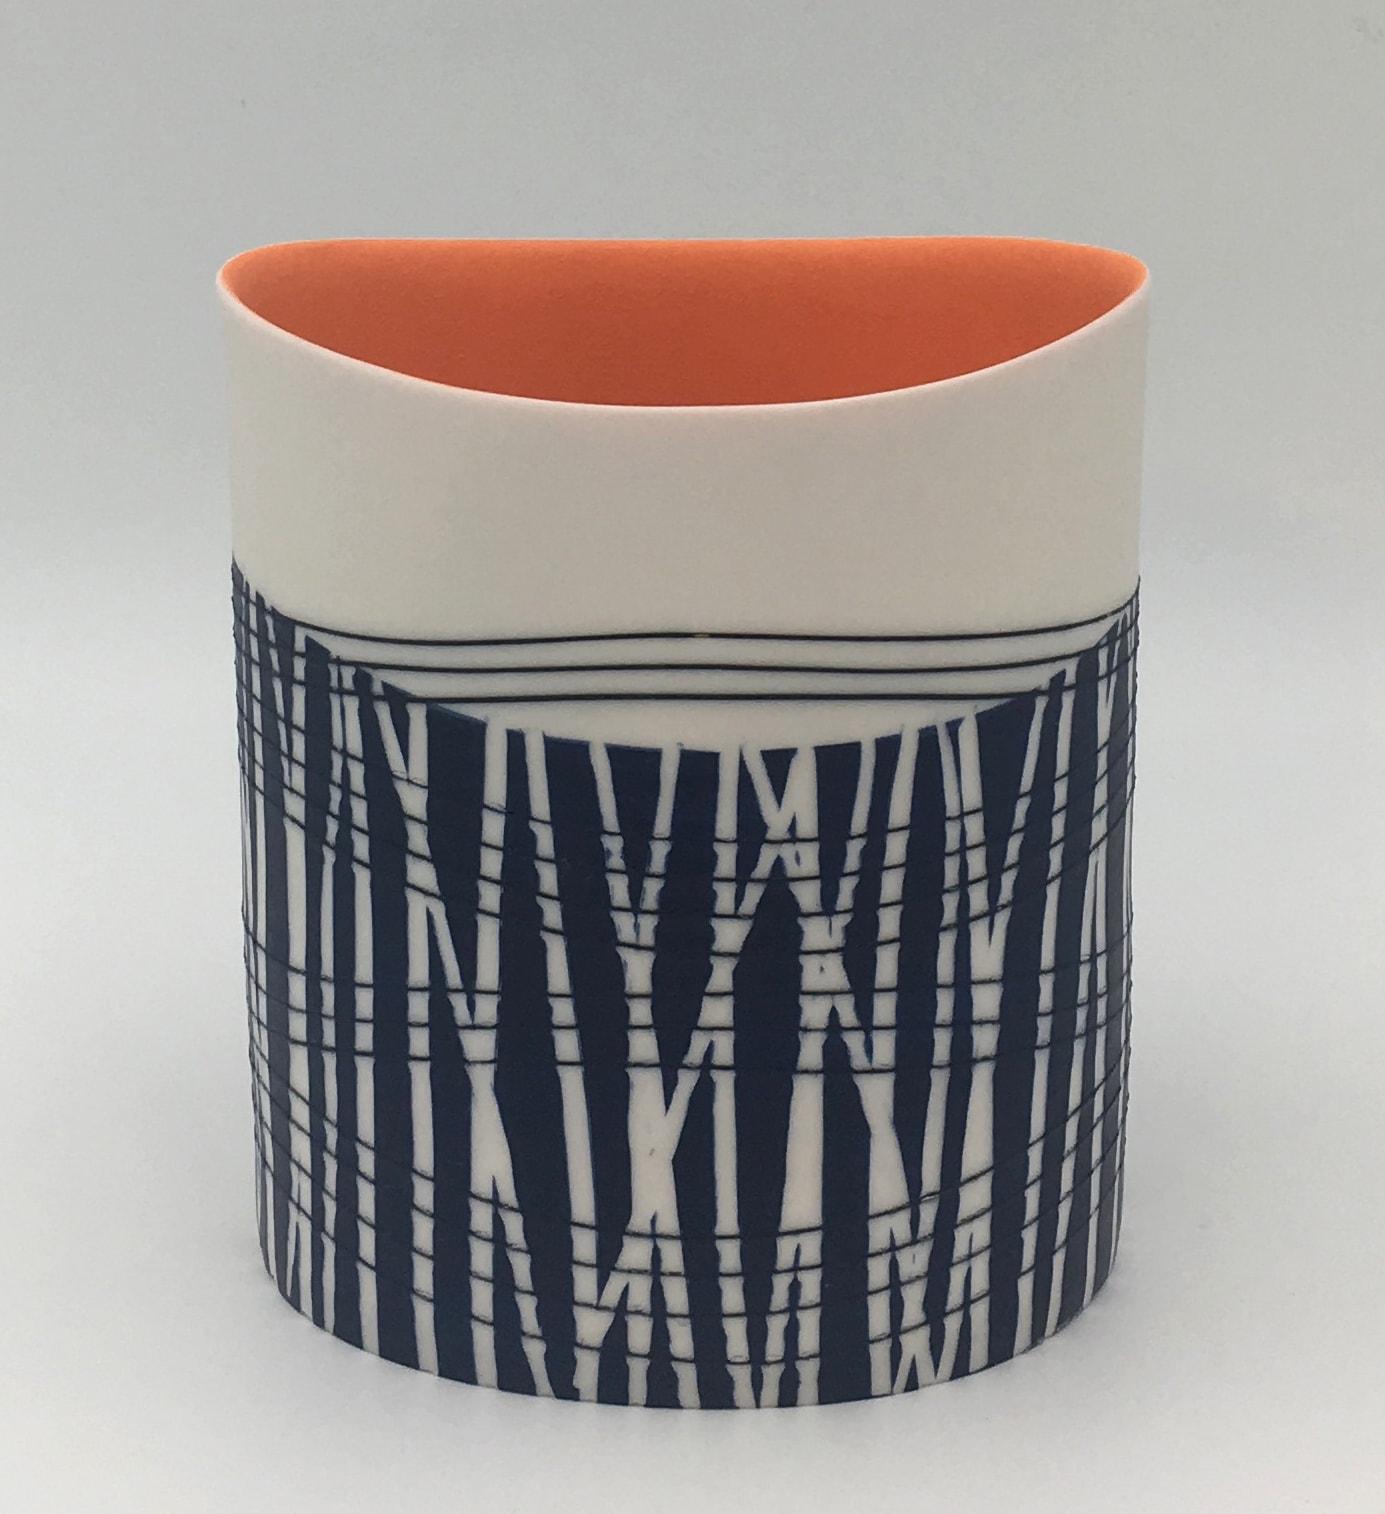 "<span class=""link fancybox-details-link""><a href=""/artists/195-lara-scobie/works/6523-lara-scobie-oval-vessel-with-orange-interior-2019/"">View Detail Page</a></span><div class=""artist""><strong>Lara Scobie</strong></div> b. 1967 <div class=""title""><em>Oval Vessel with Orange Interior</em>, 2019</div> <div class=""medium"">Porcelain</div><div class=""copyright_line"">Ownart: £28 x 10 Months, 0% APR</div>"